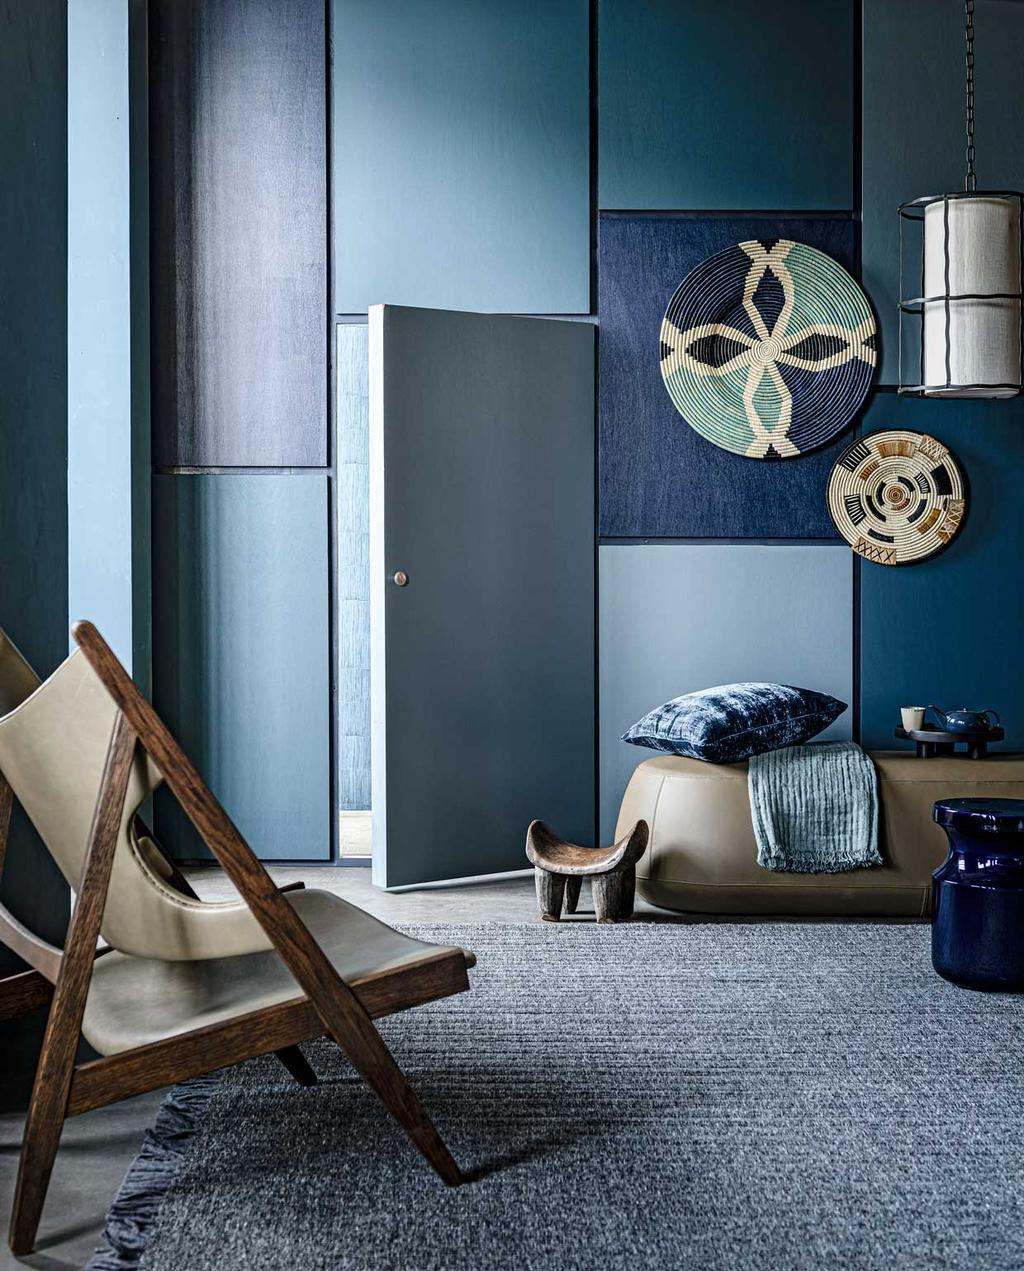 vtwonen 11-2020 | styling blauw zithoek in de slaapkamer